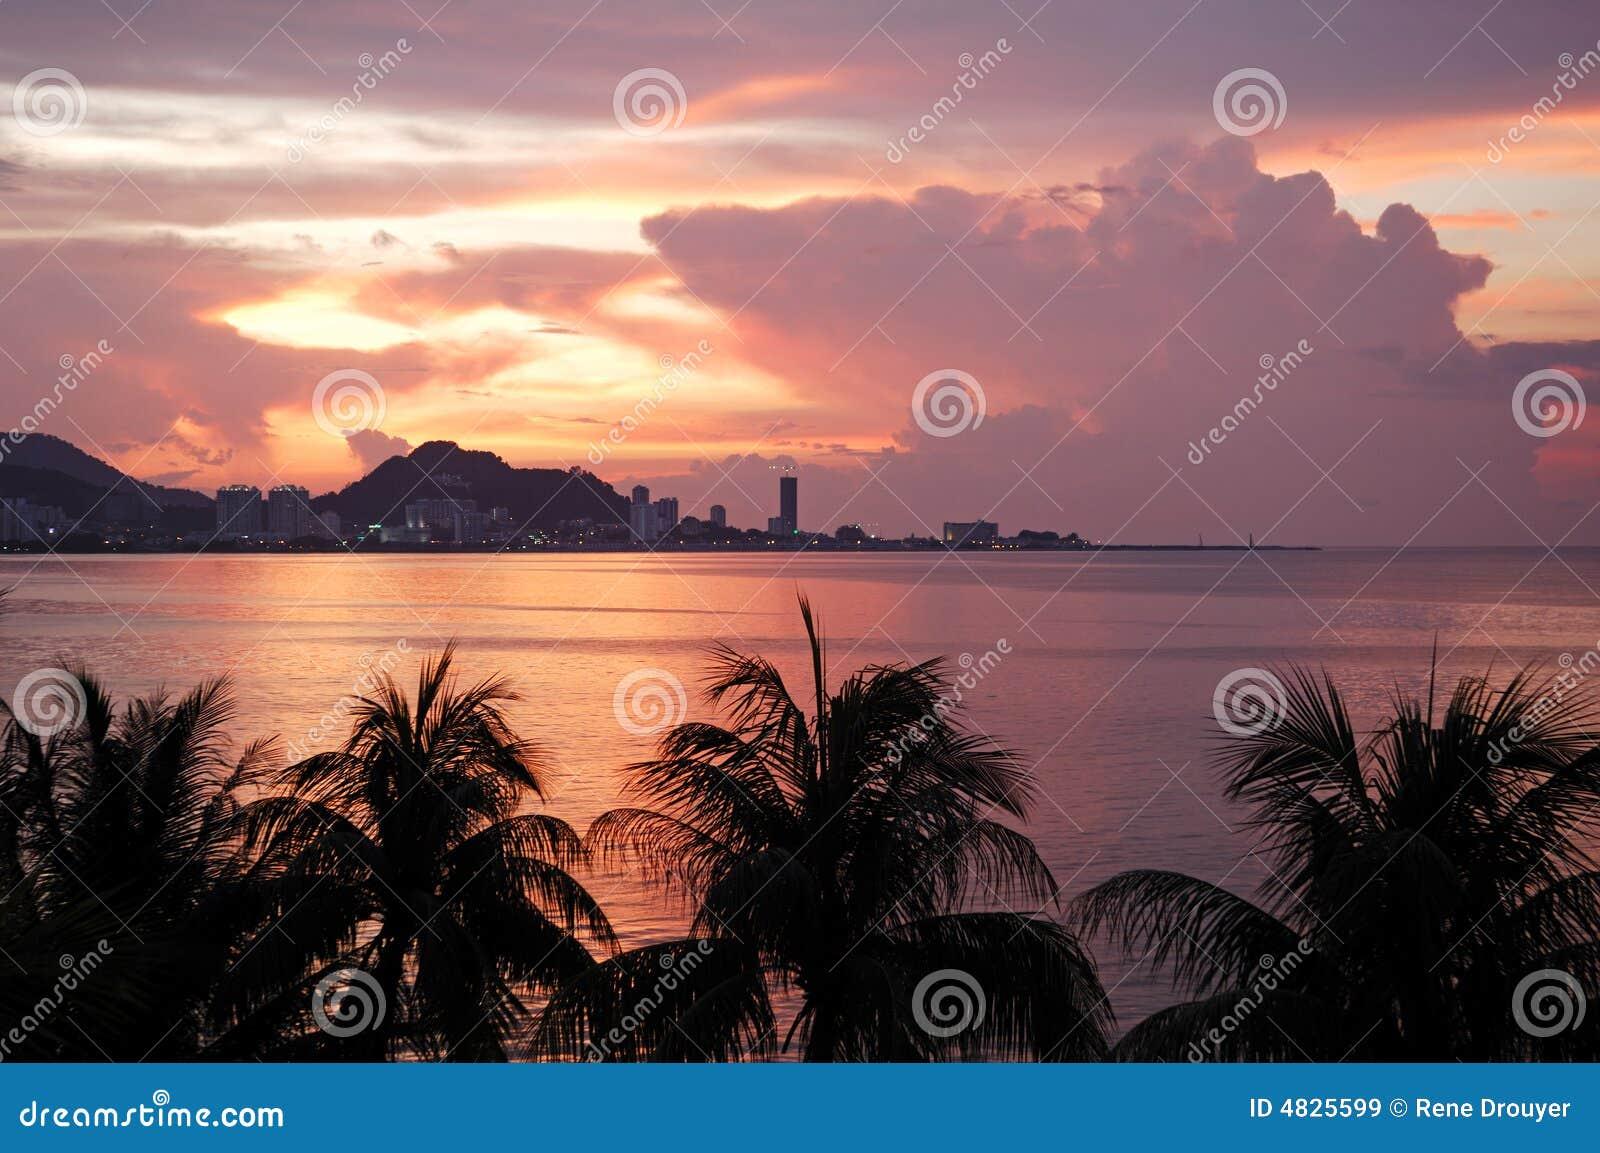 Malaysia, Penang: Stadtansicht am Sonnenuntergang